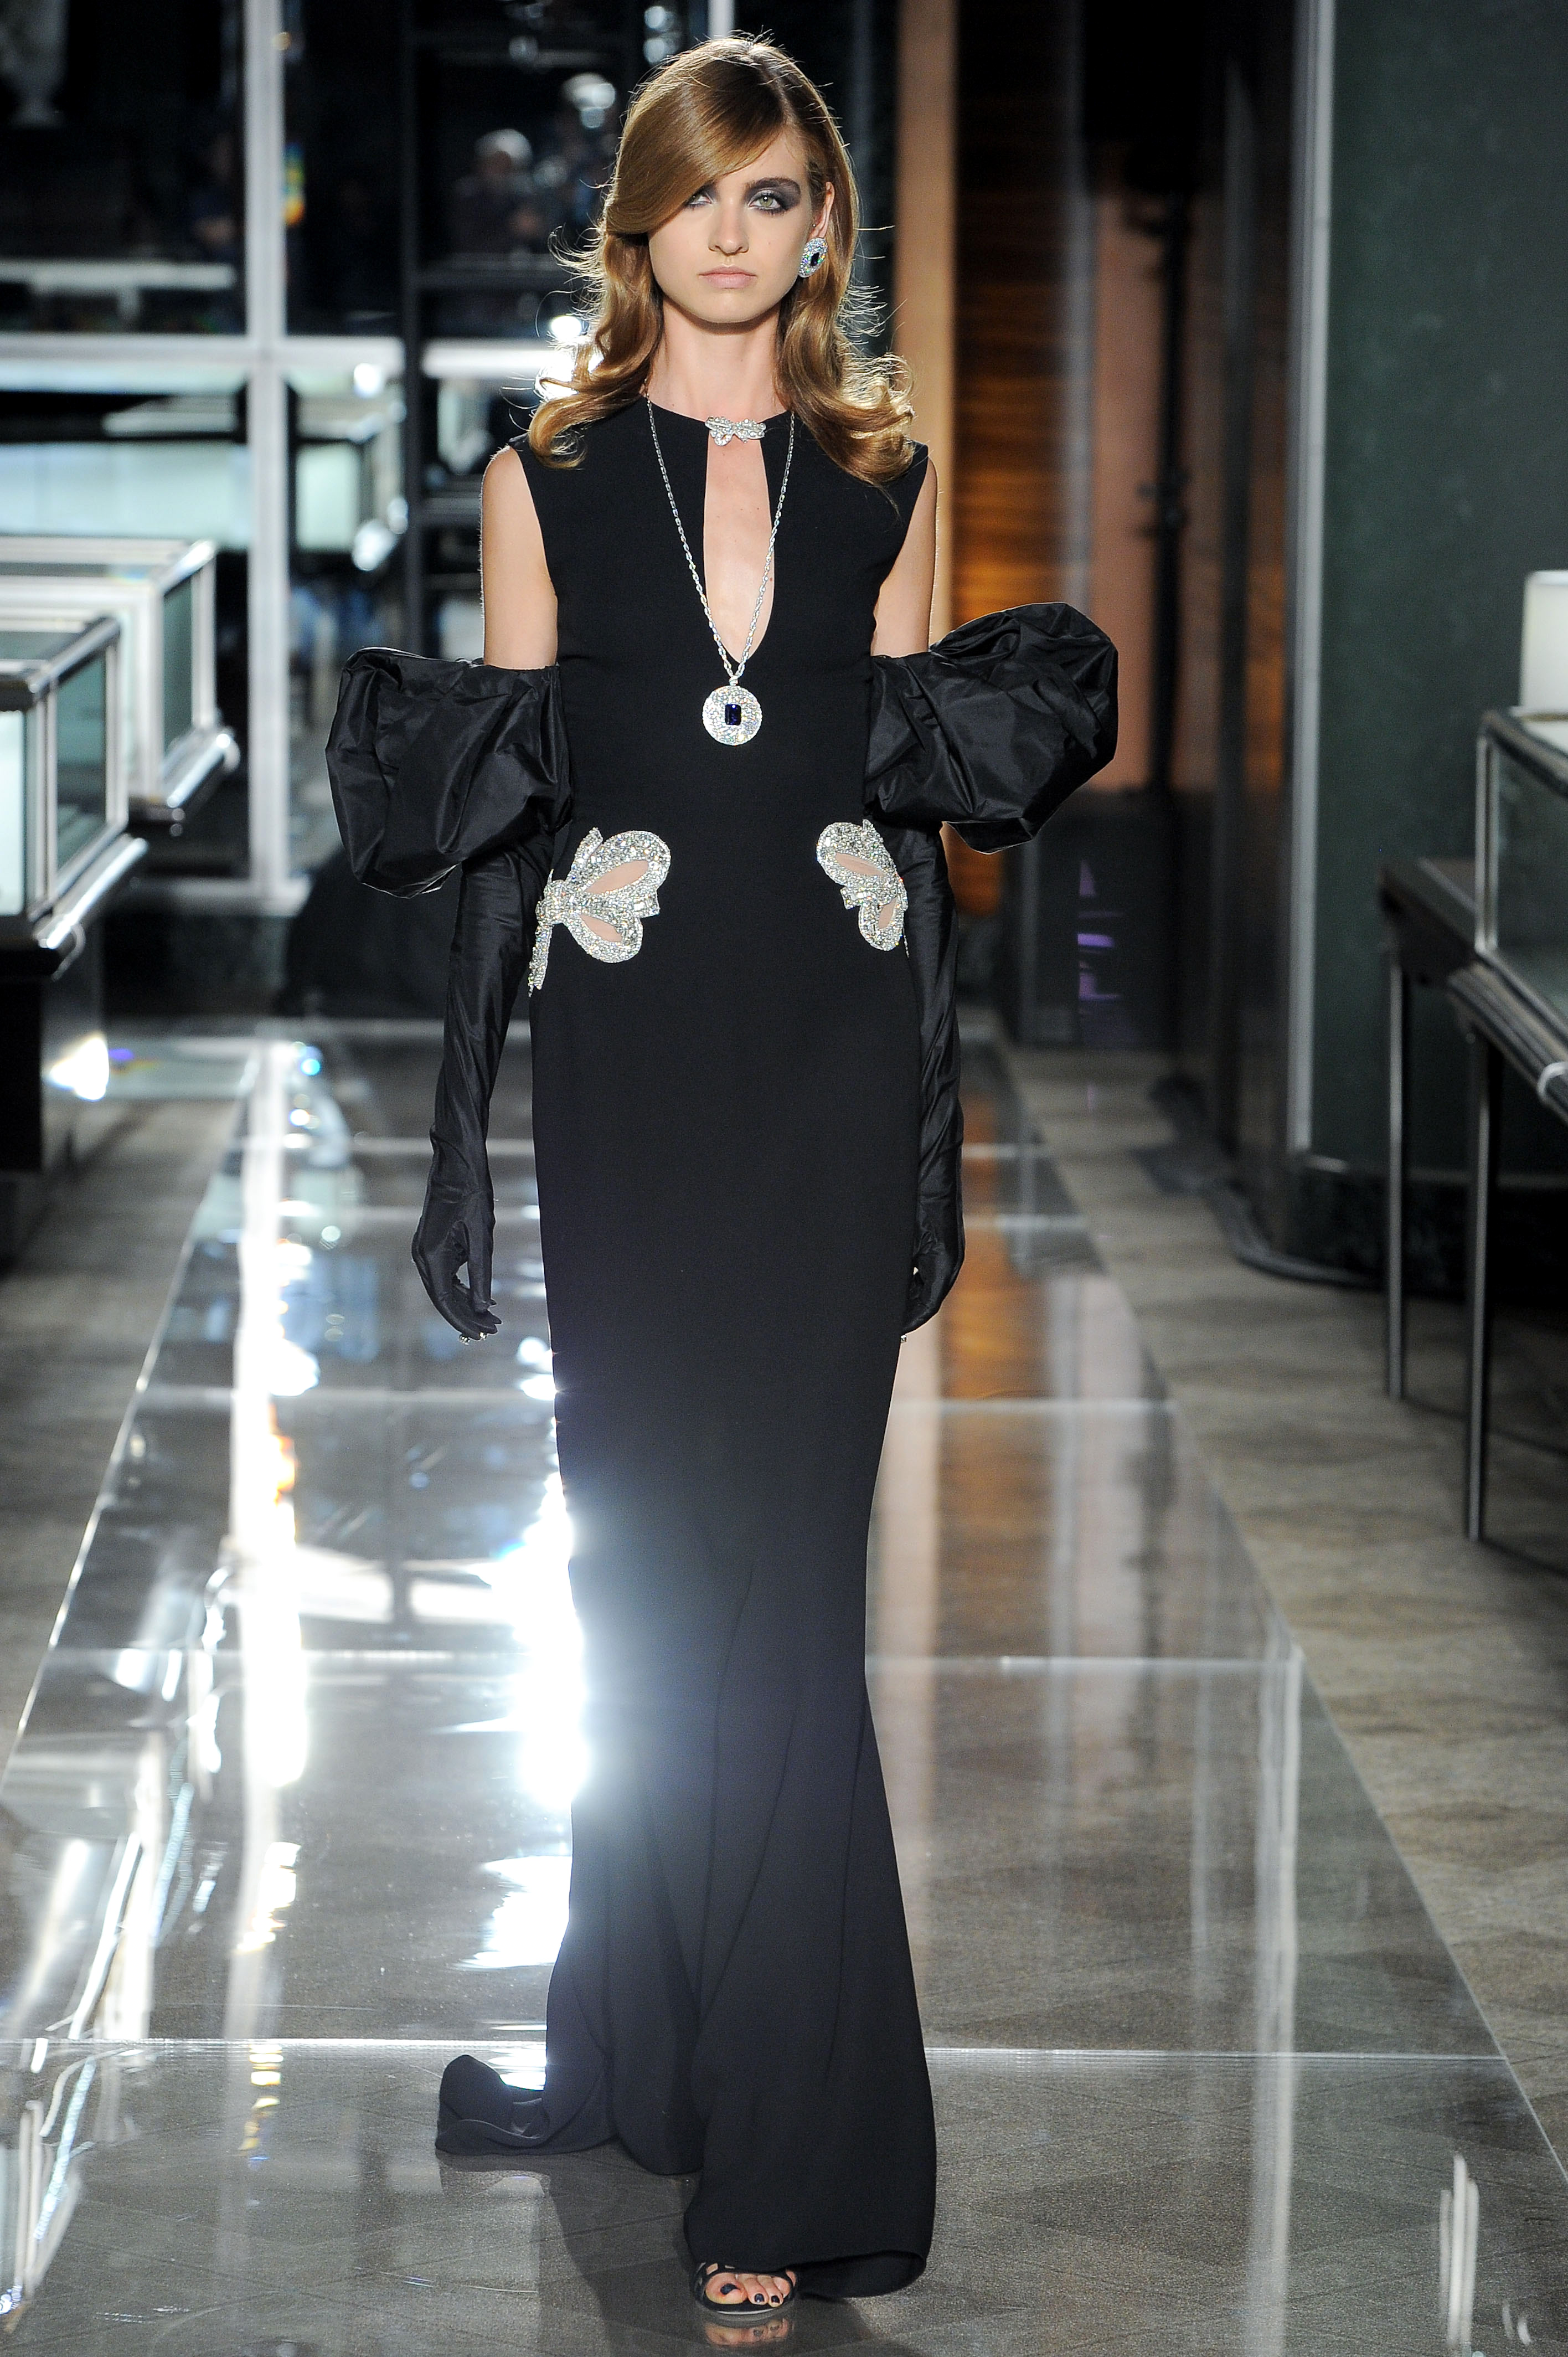 reem acra spring 2018 black wedding dress with keyhole neckline and dramatic gloves